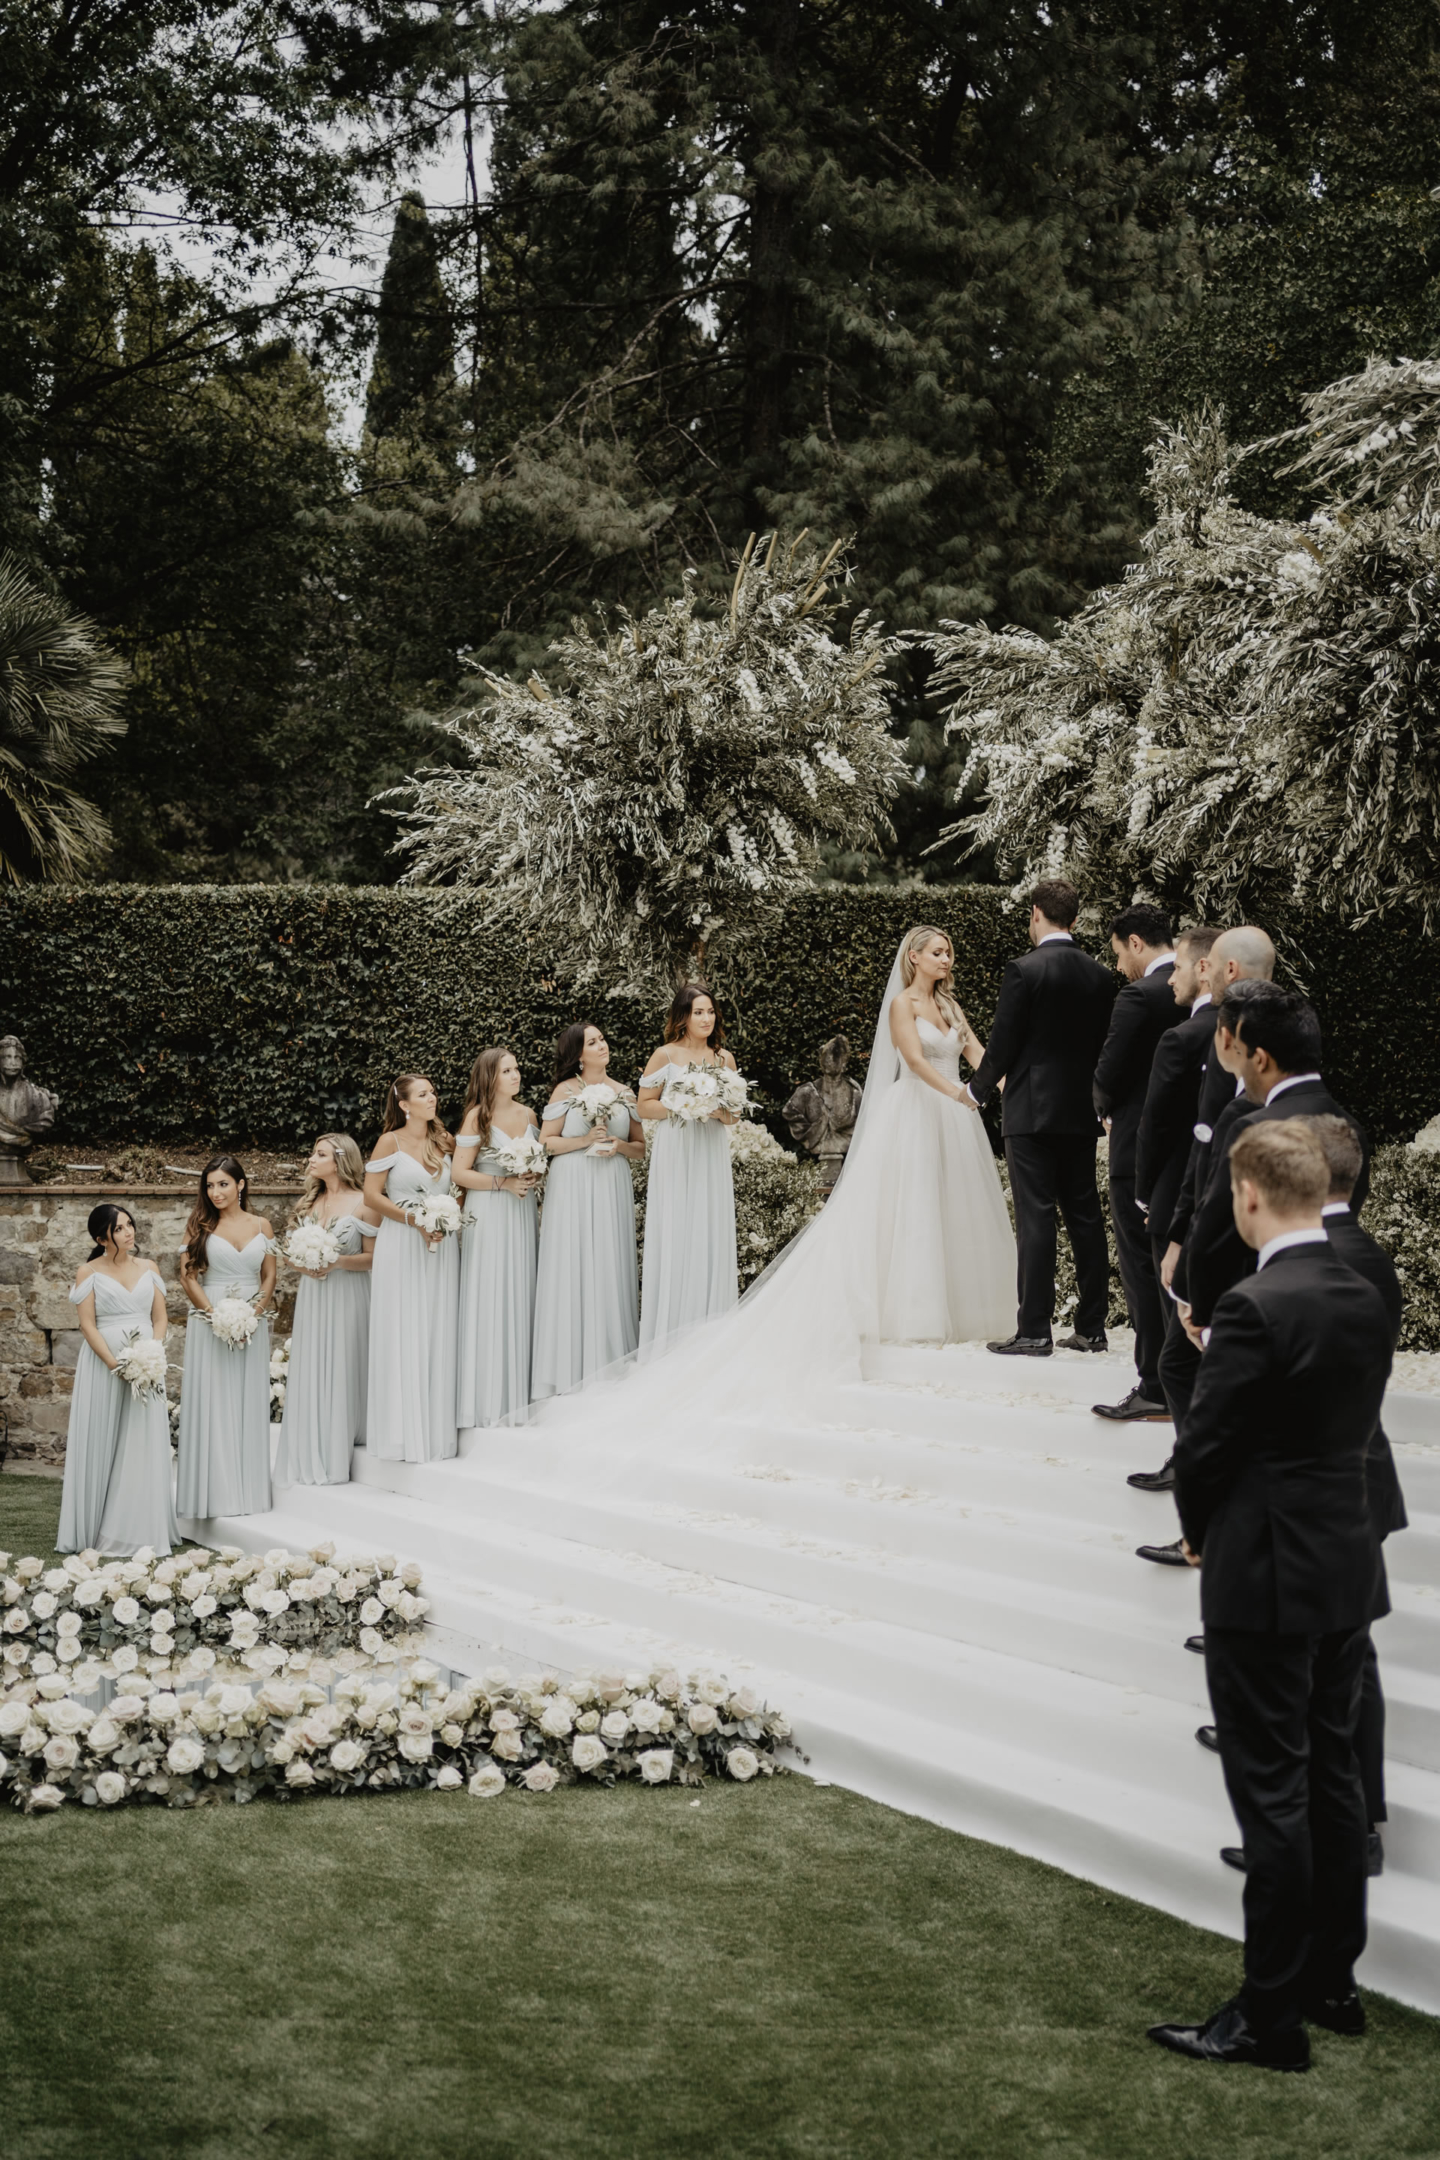 A sparkling wedding in the shore of the Arno - 37 :: A sparkling wedding on the shore of the Arno :: Luxury wedding photography - 36 :: A sparkling wedding in the shore of the Arno - 37